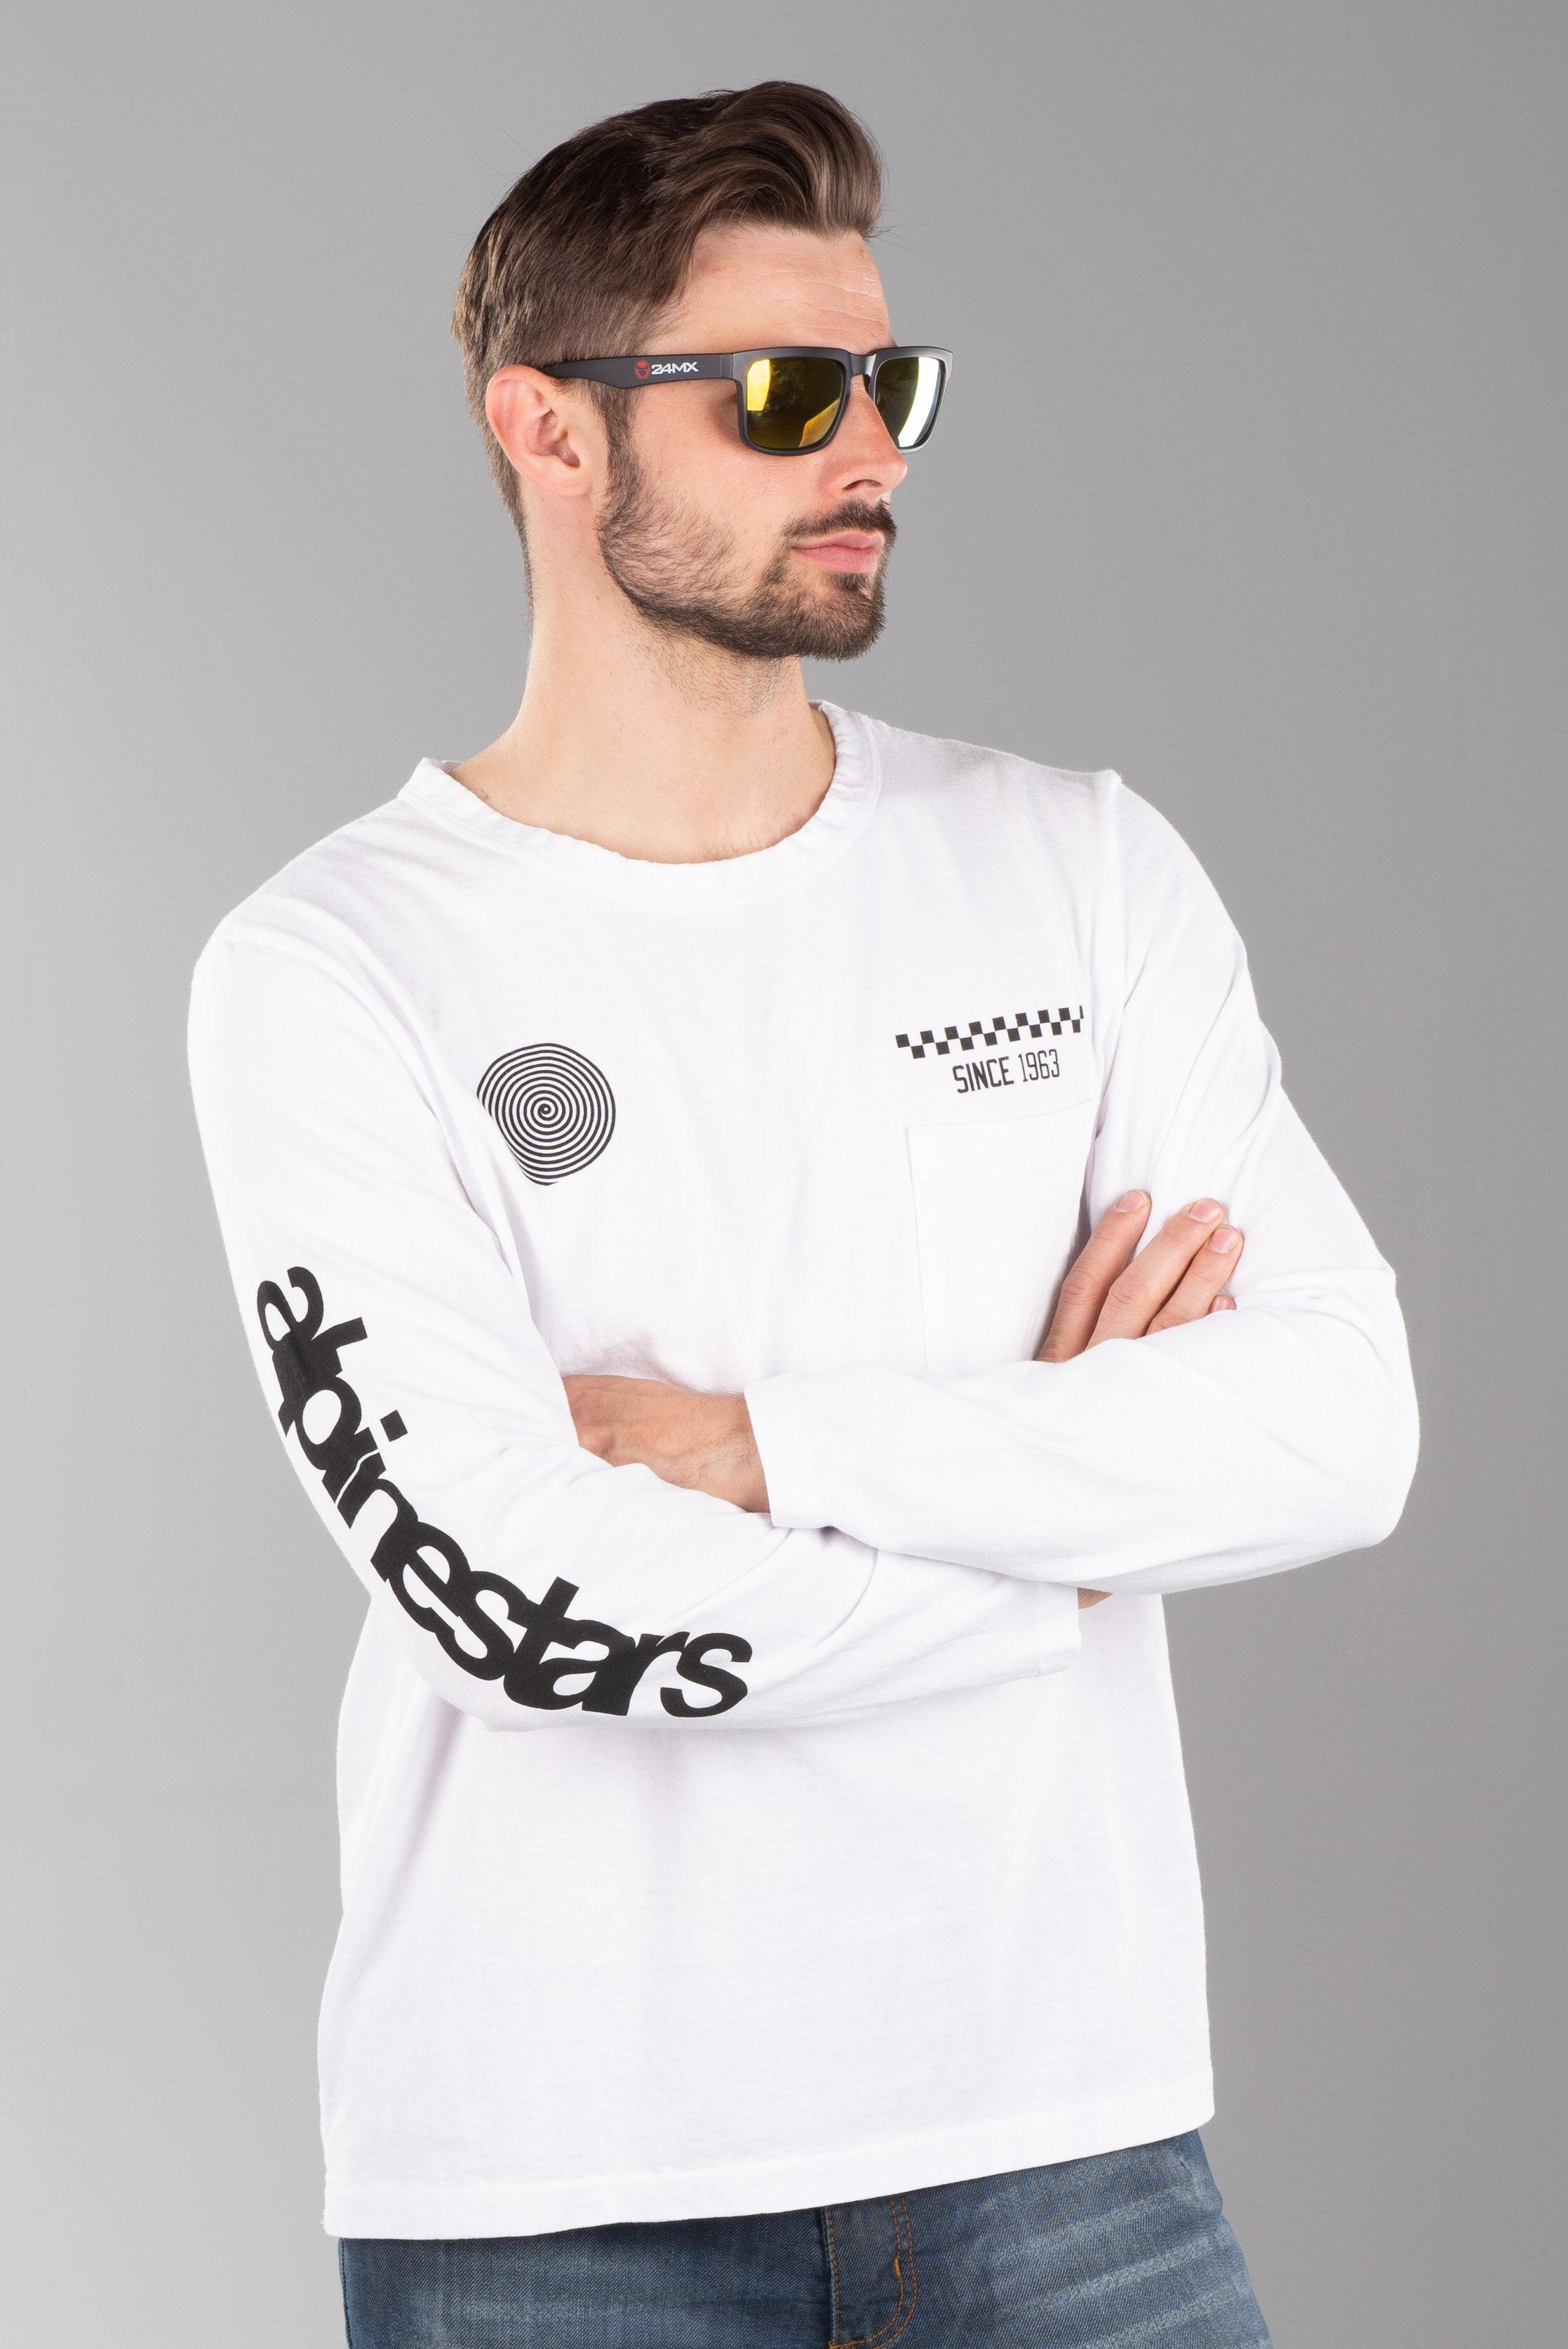 Alpinestars Camiseta Alpinestars The Real Deal Blanca